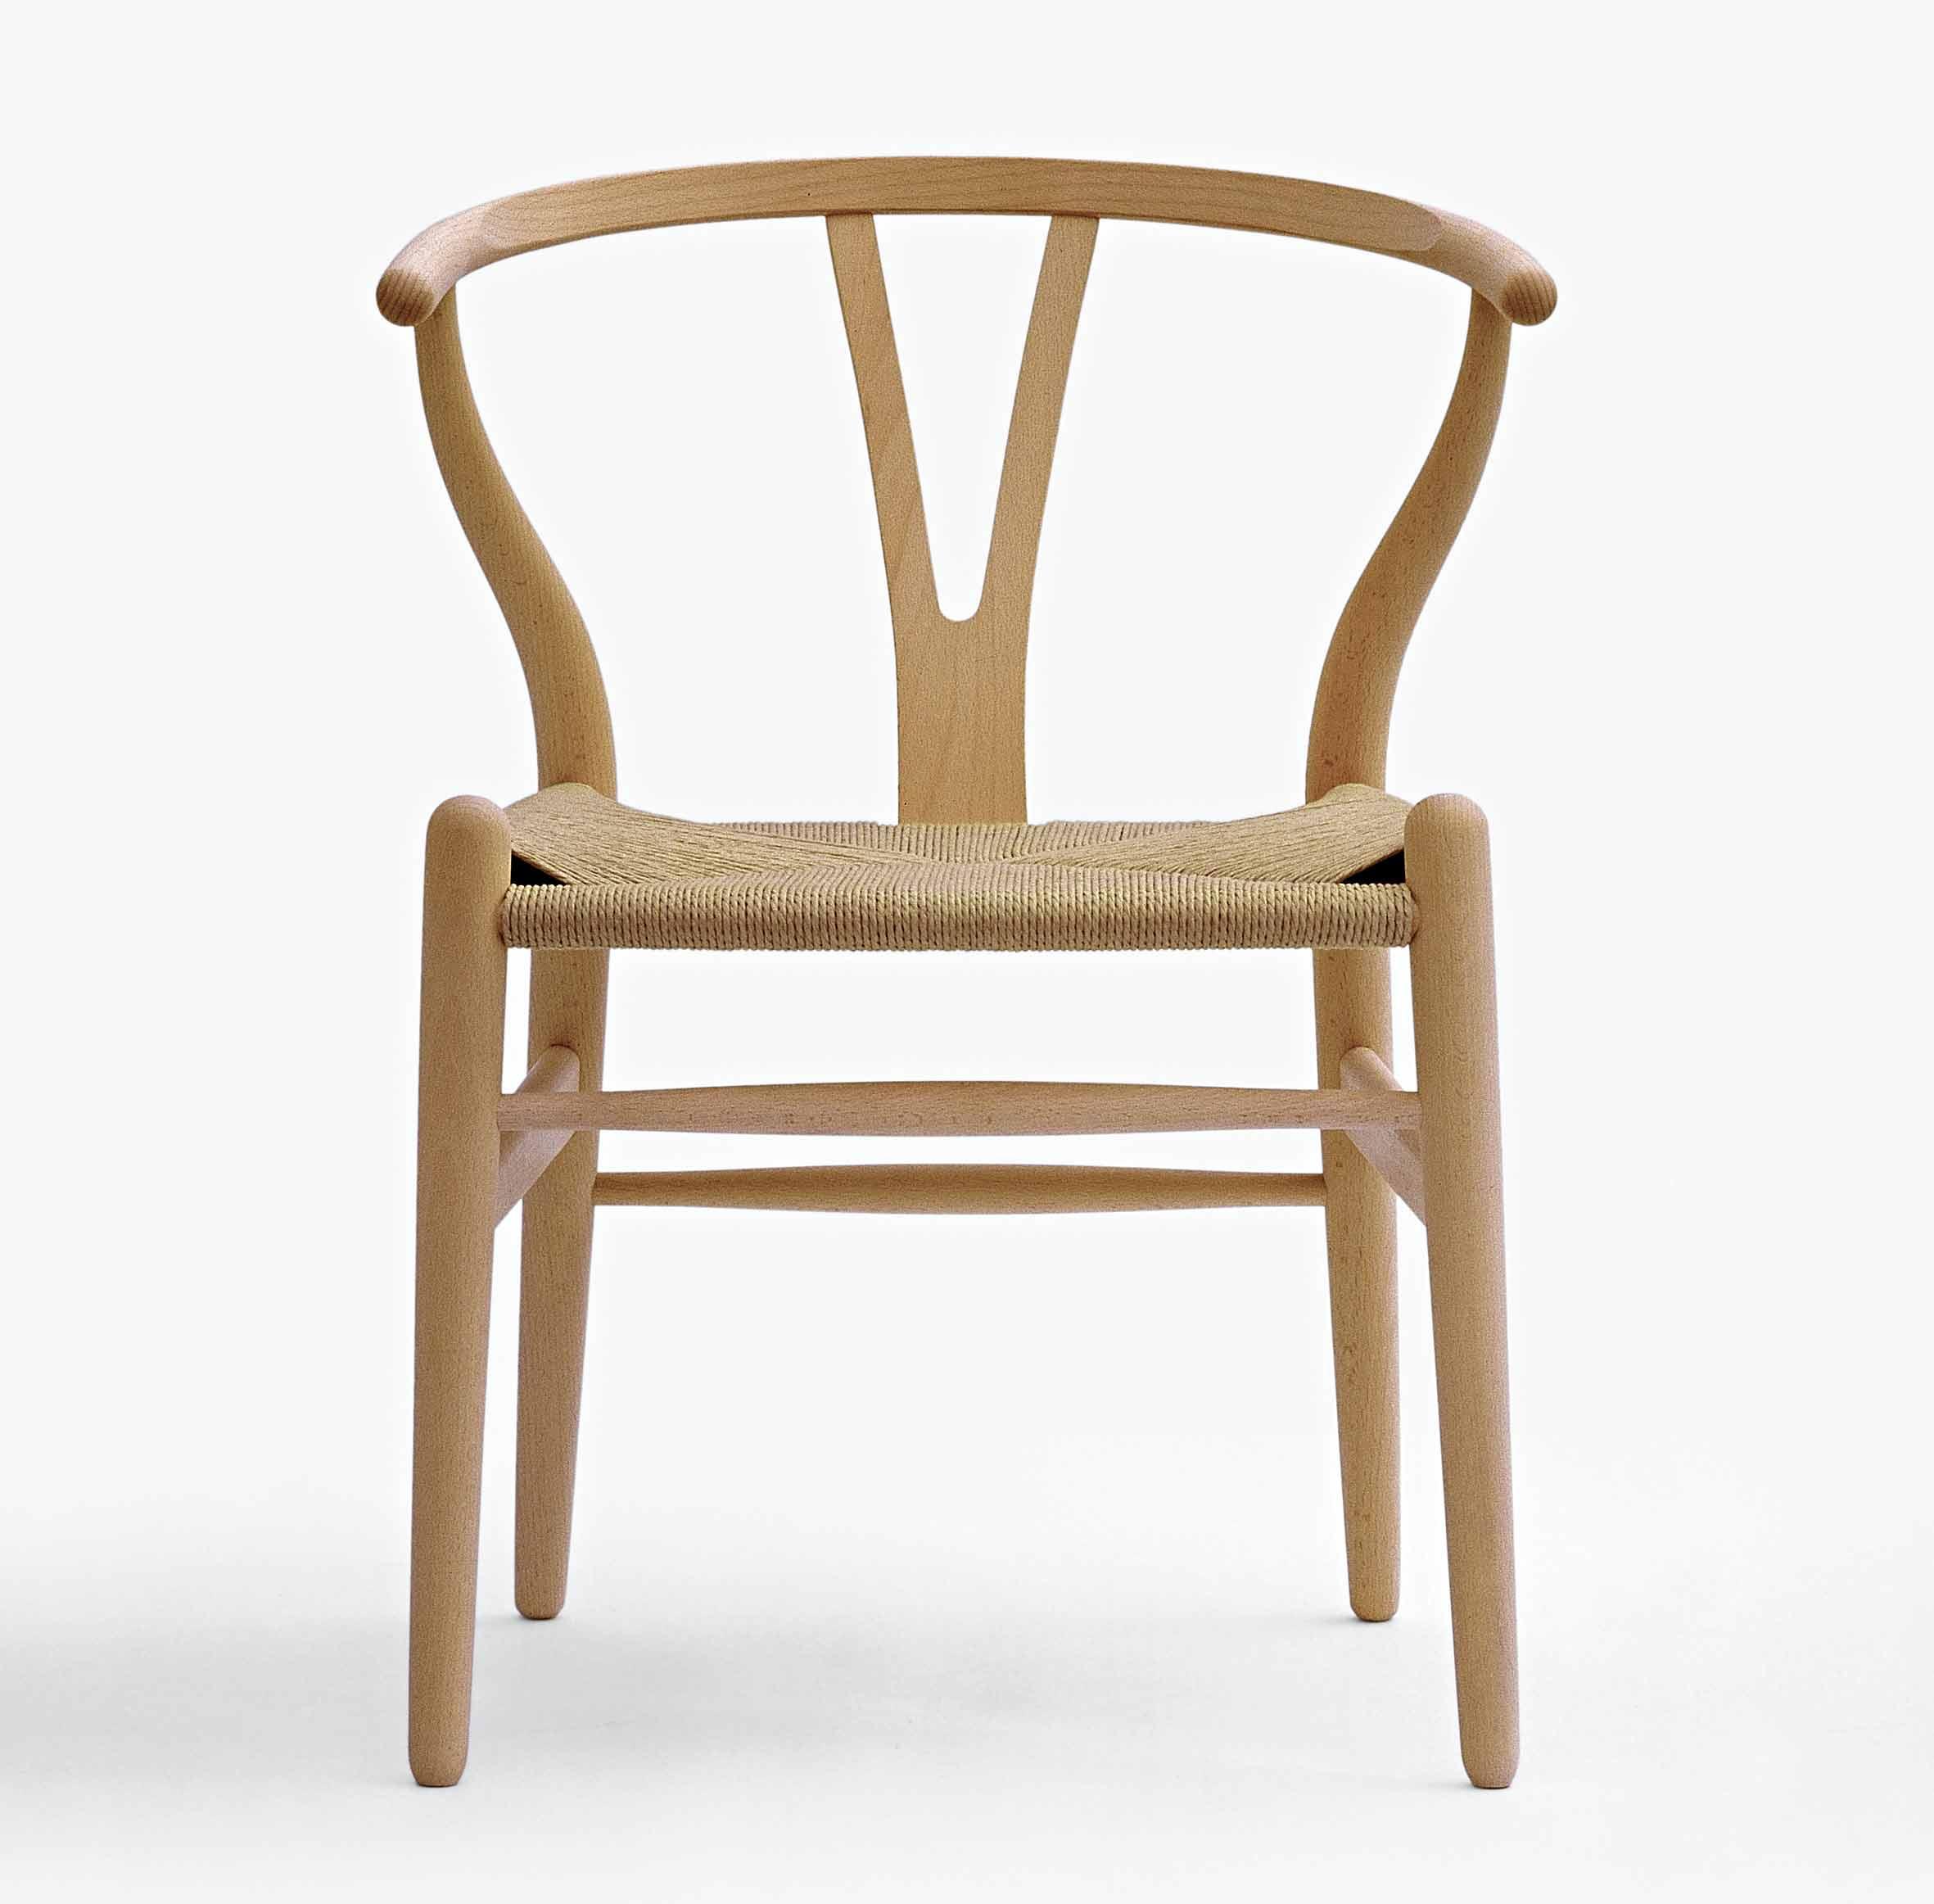 Y-tuoli kulkee myös CH24- ja Wishbone-tuolien nimellä.